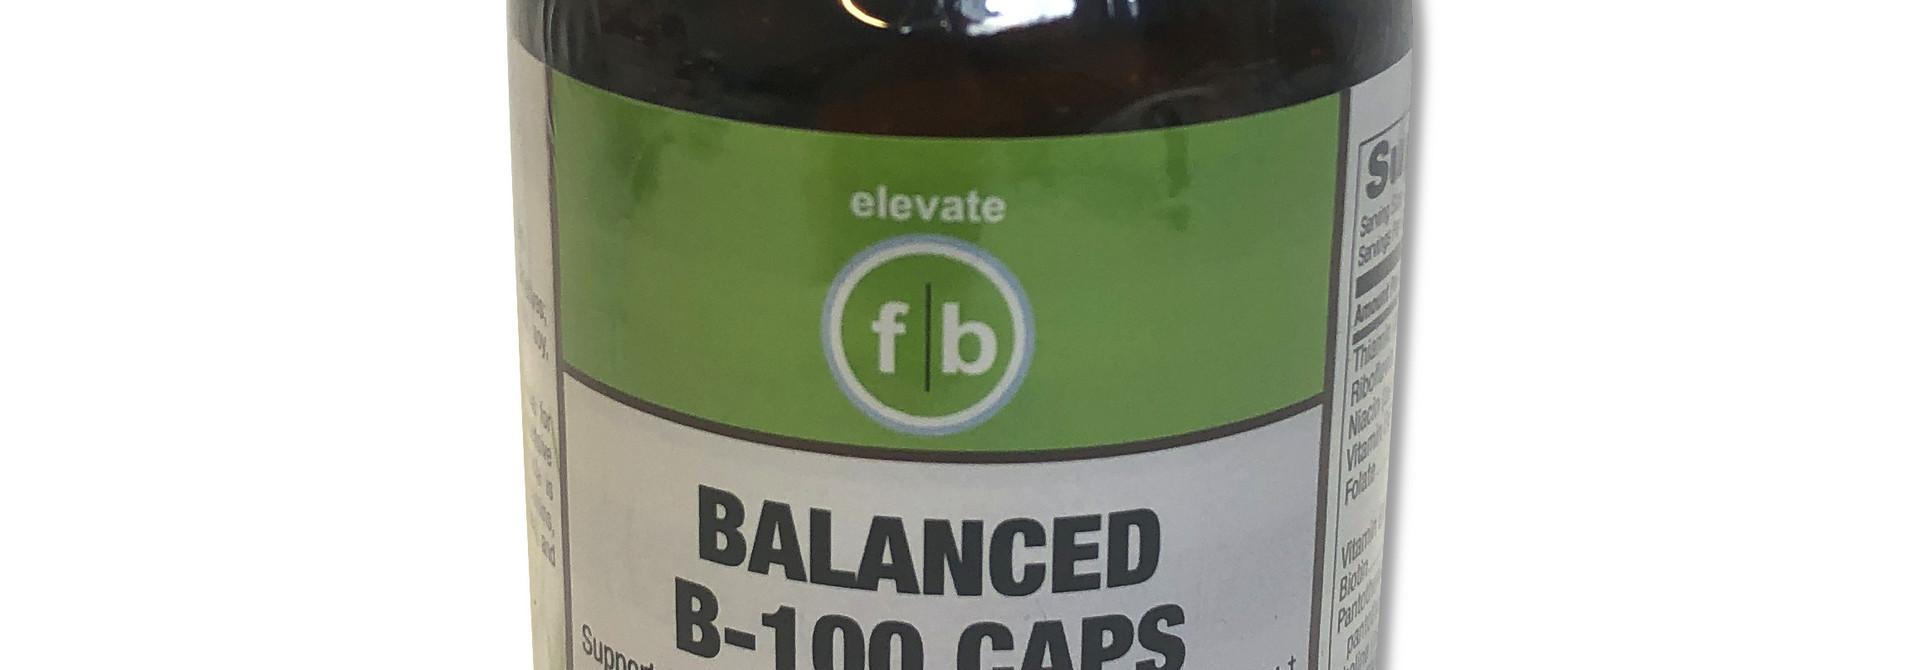 Balanced B-100 Caps